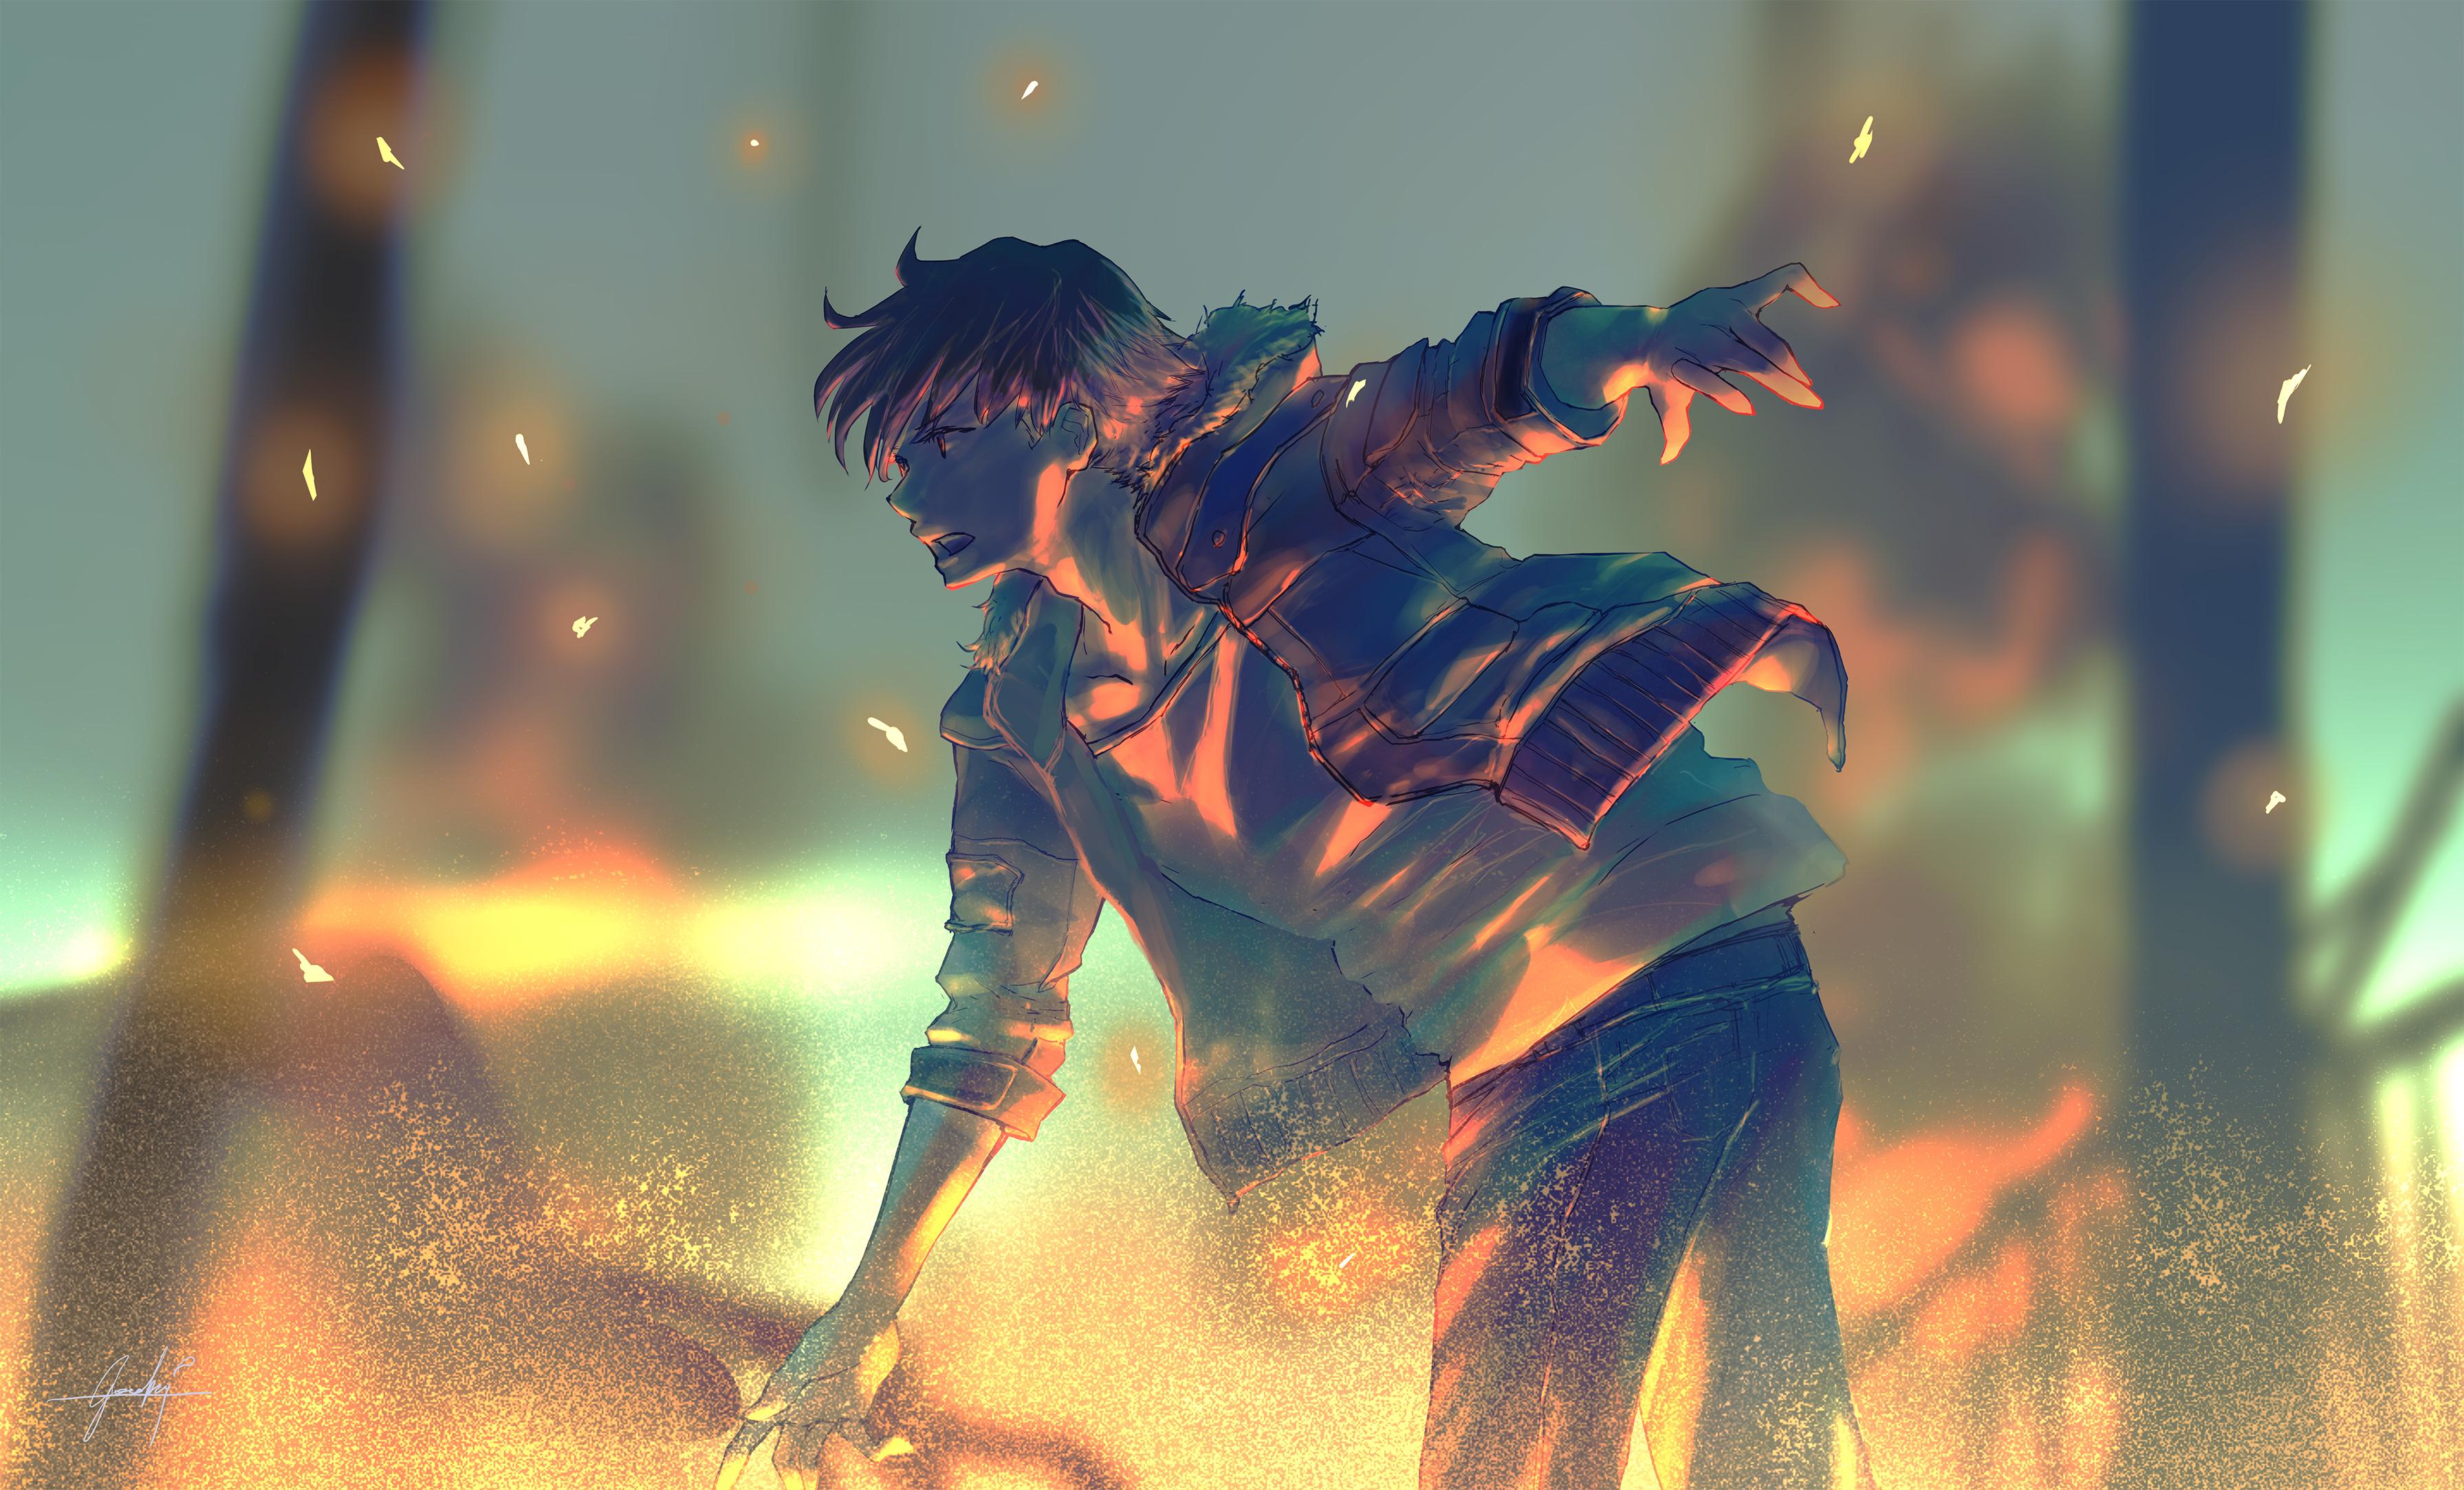 Boy Anime Artwork, HD Anime, 4k Wallpapers, Images ...